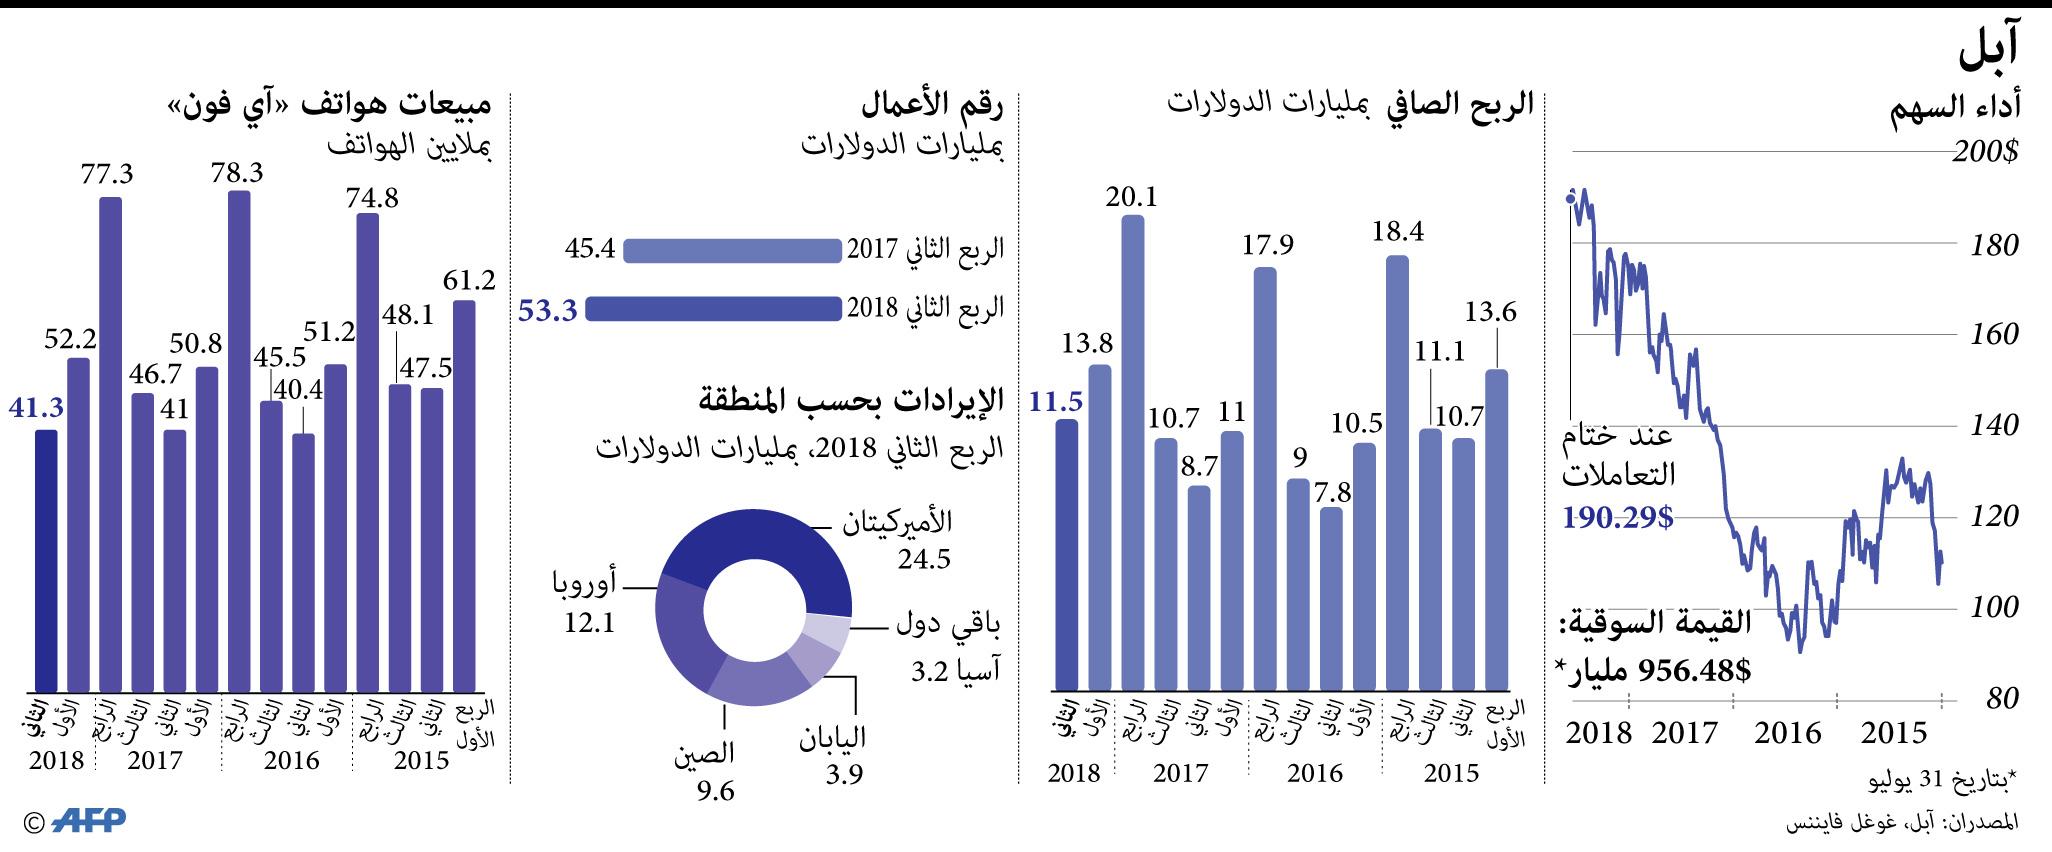 إيرادات أبل منذ 2015